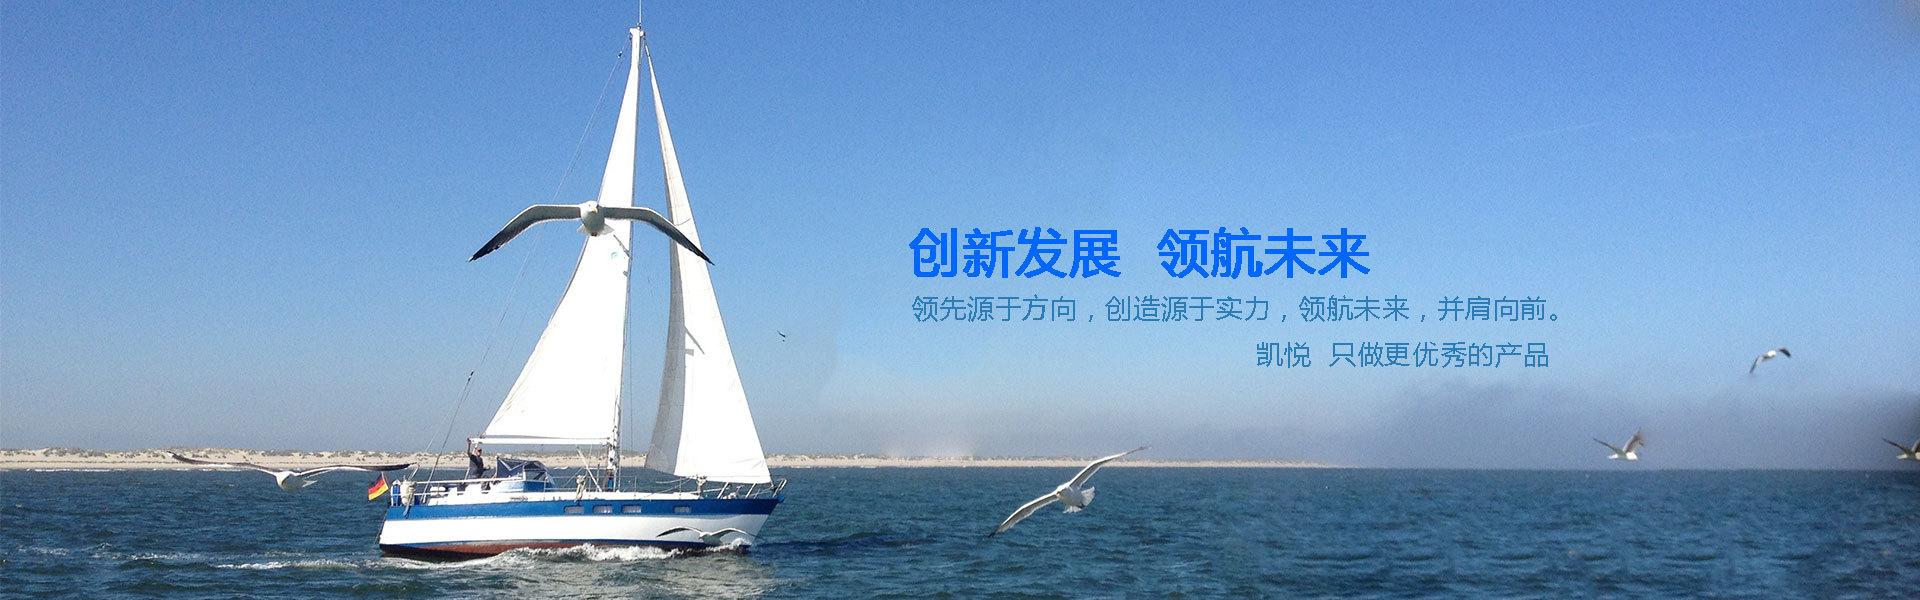 20056.com太阳城